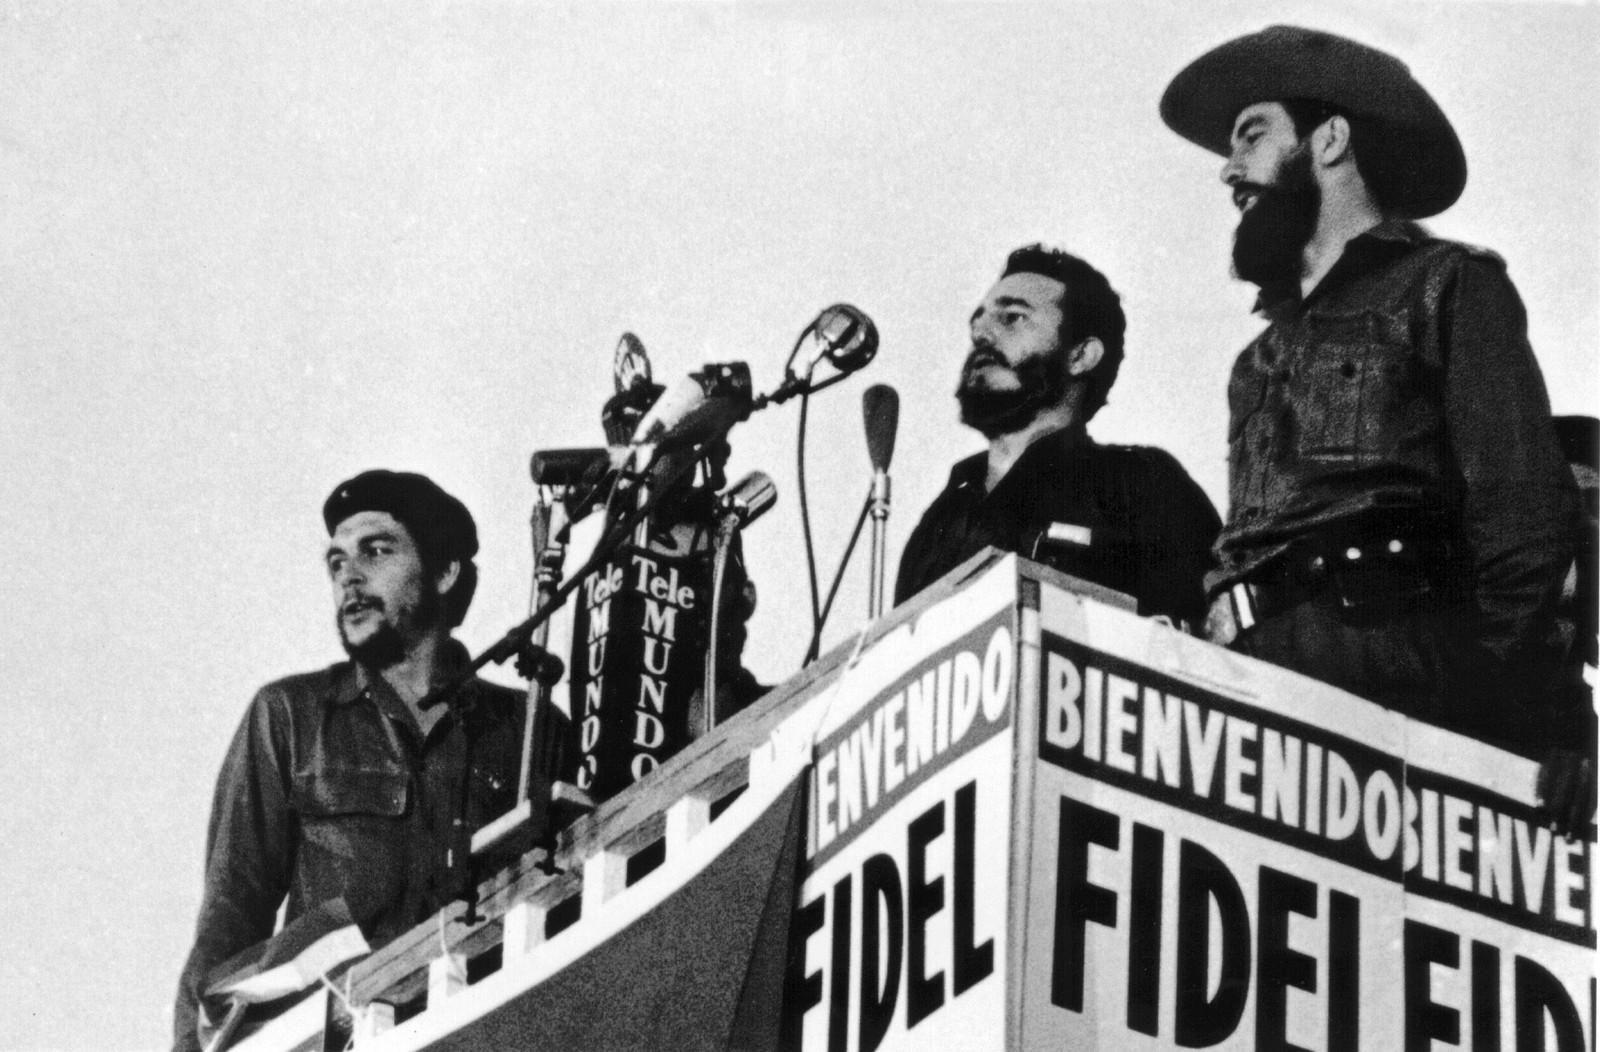 Fidel Castro avbildet mens han holder en tale i Havana etter maktovertakelsen i januar 1959. Ved hans side står Ernesto Che Guevara og Camilo Cienfuegos.